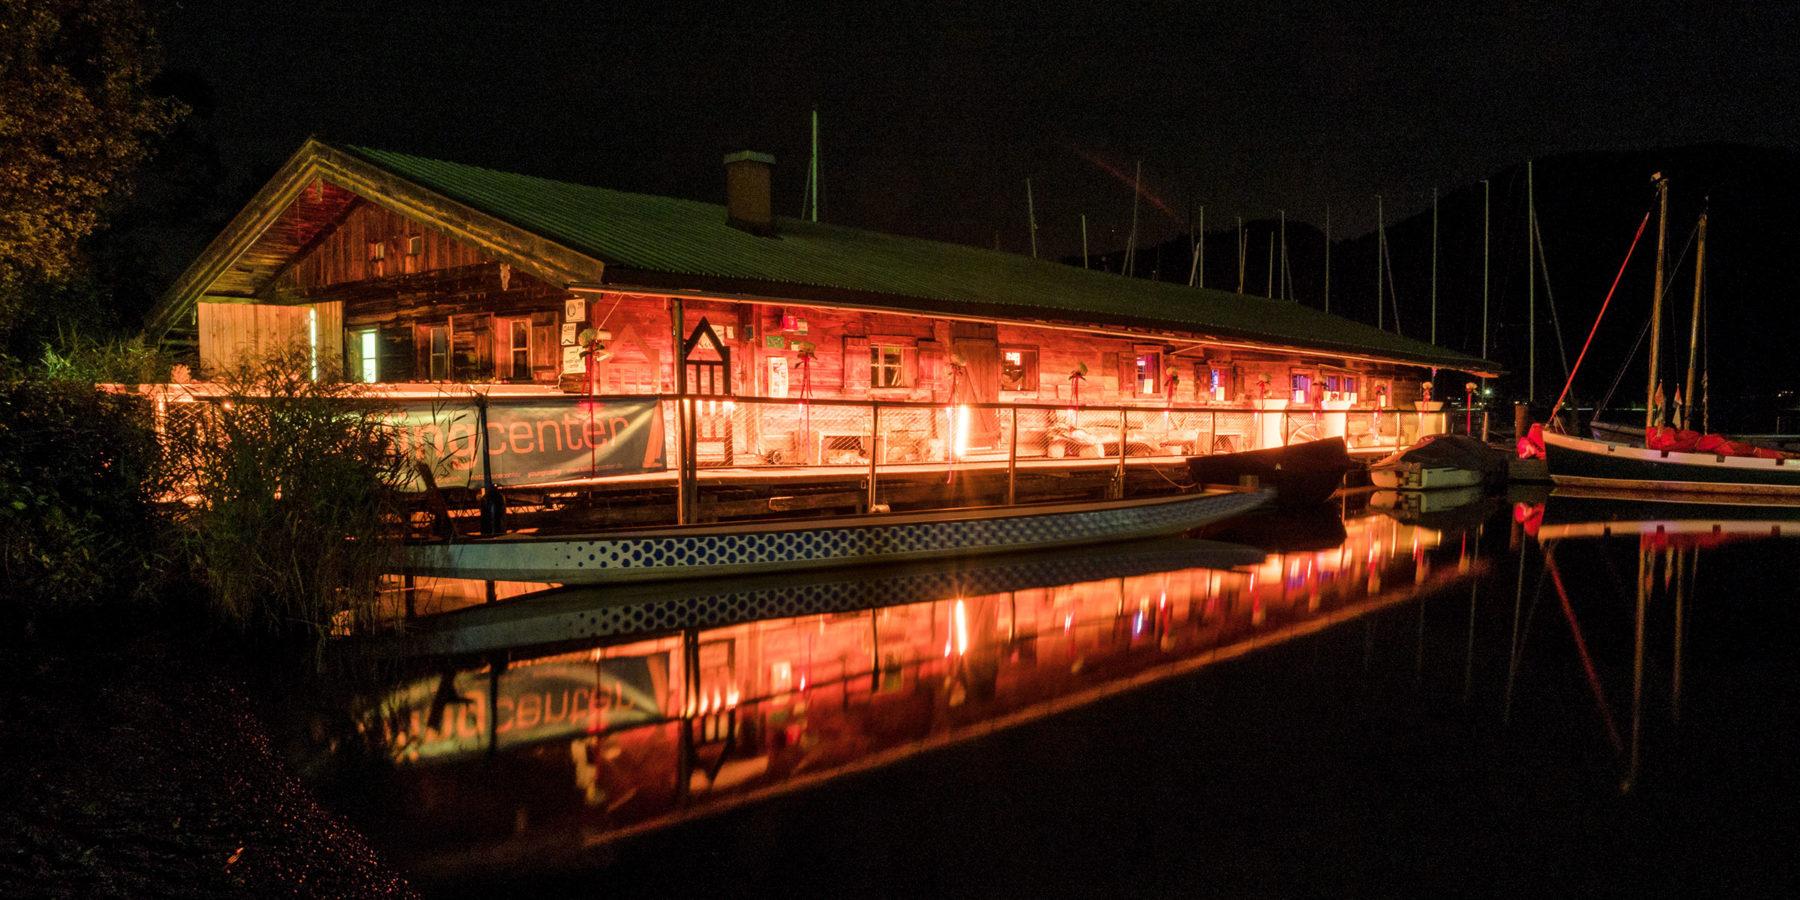 Fotograf Tegernsee Rolf Kaul Terrassenhof mit Bootshaus am See